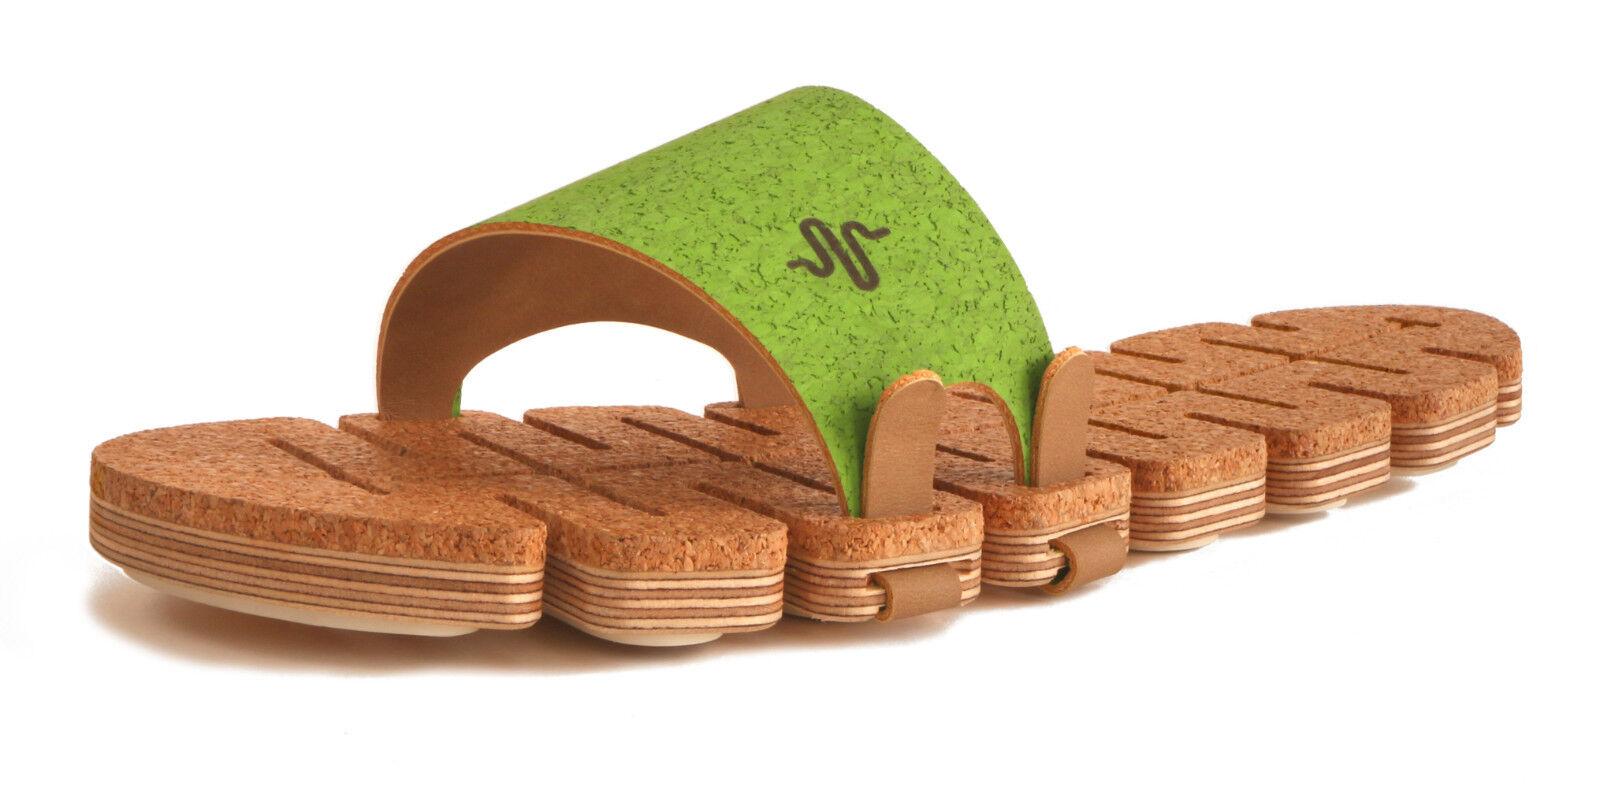 Delphi-flexible de madera sandalia-fillet-sandalias-sandalia es-damas, caballeros